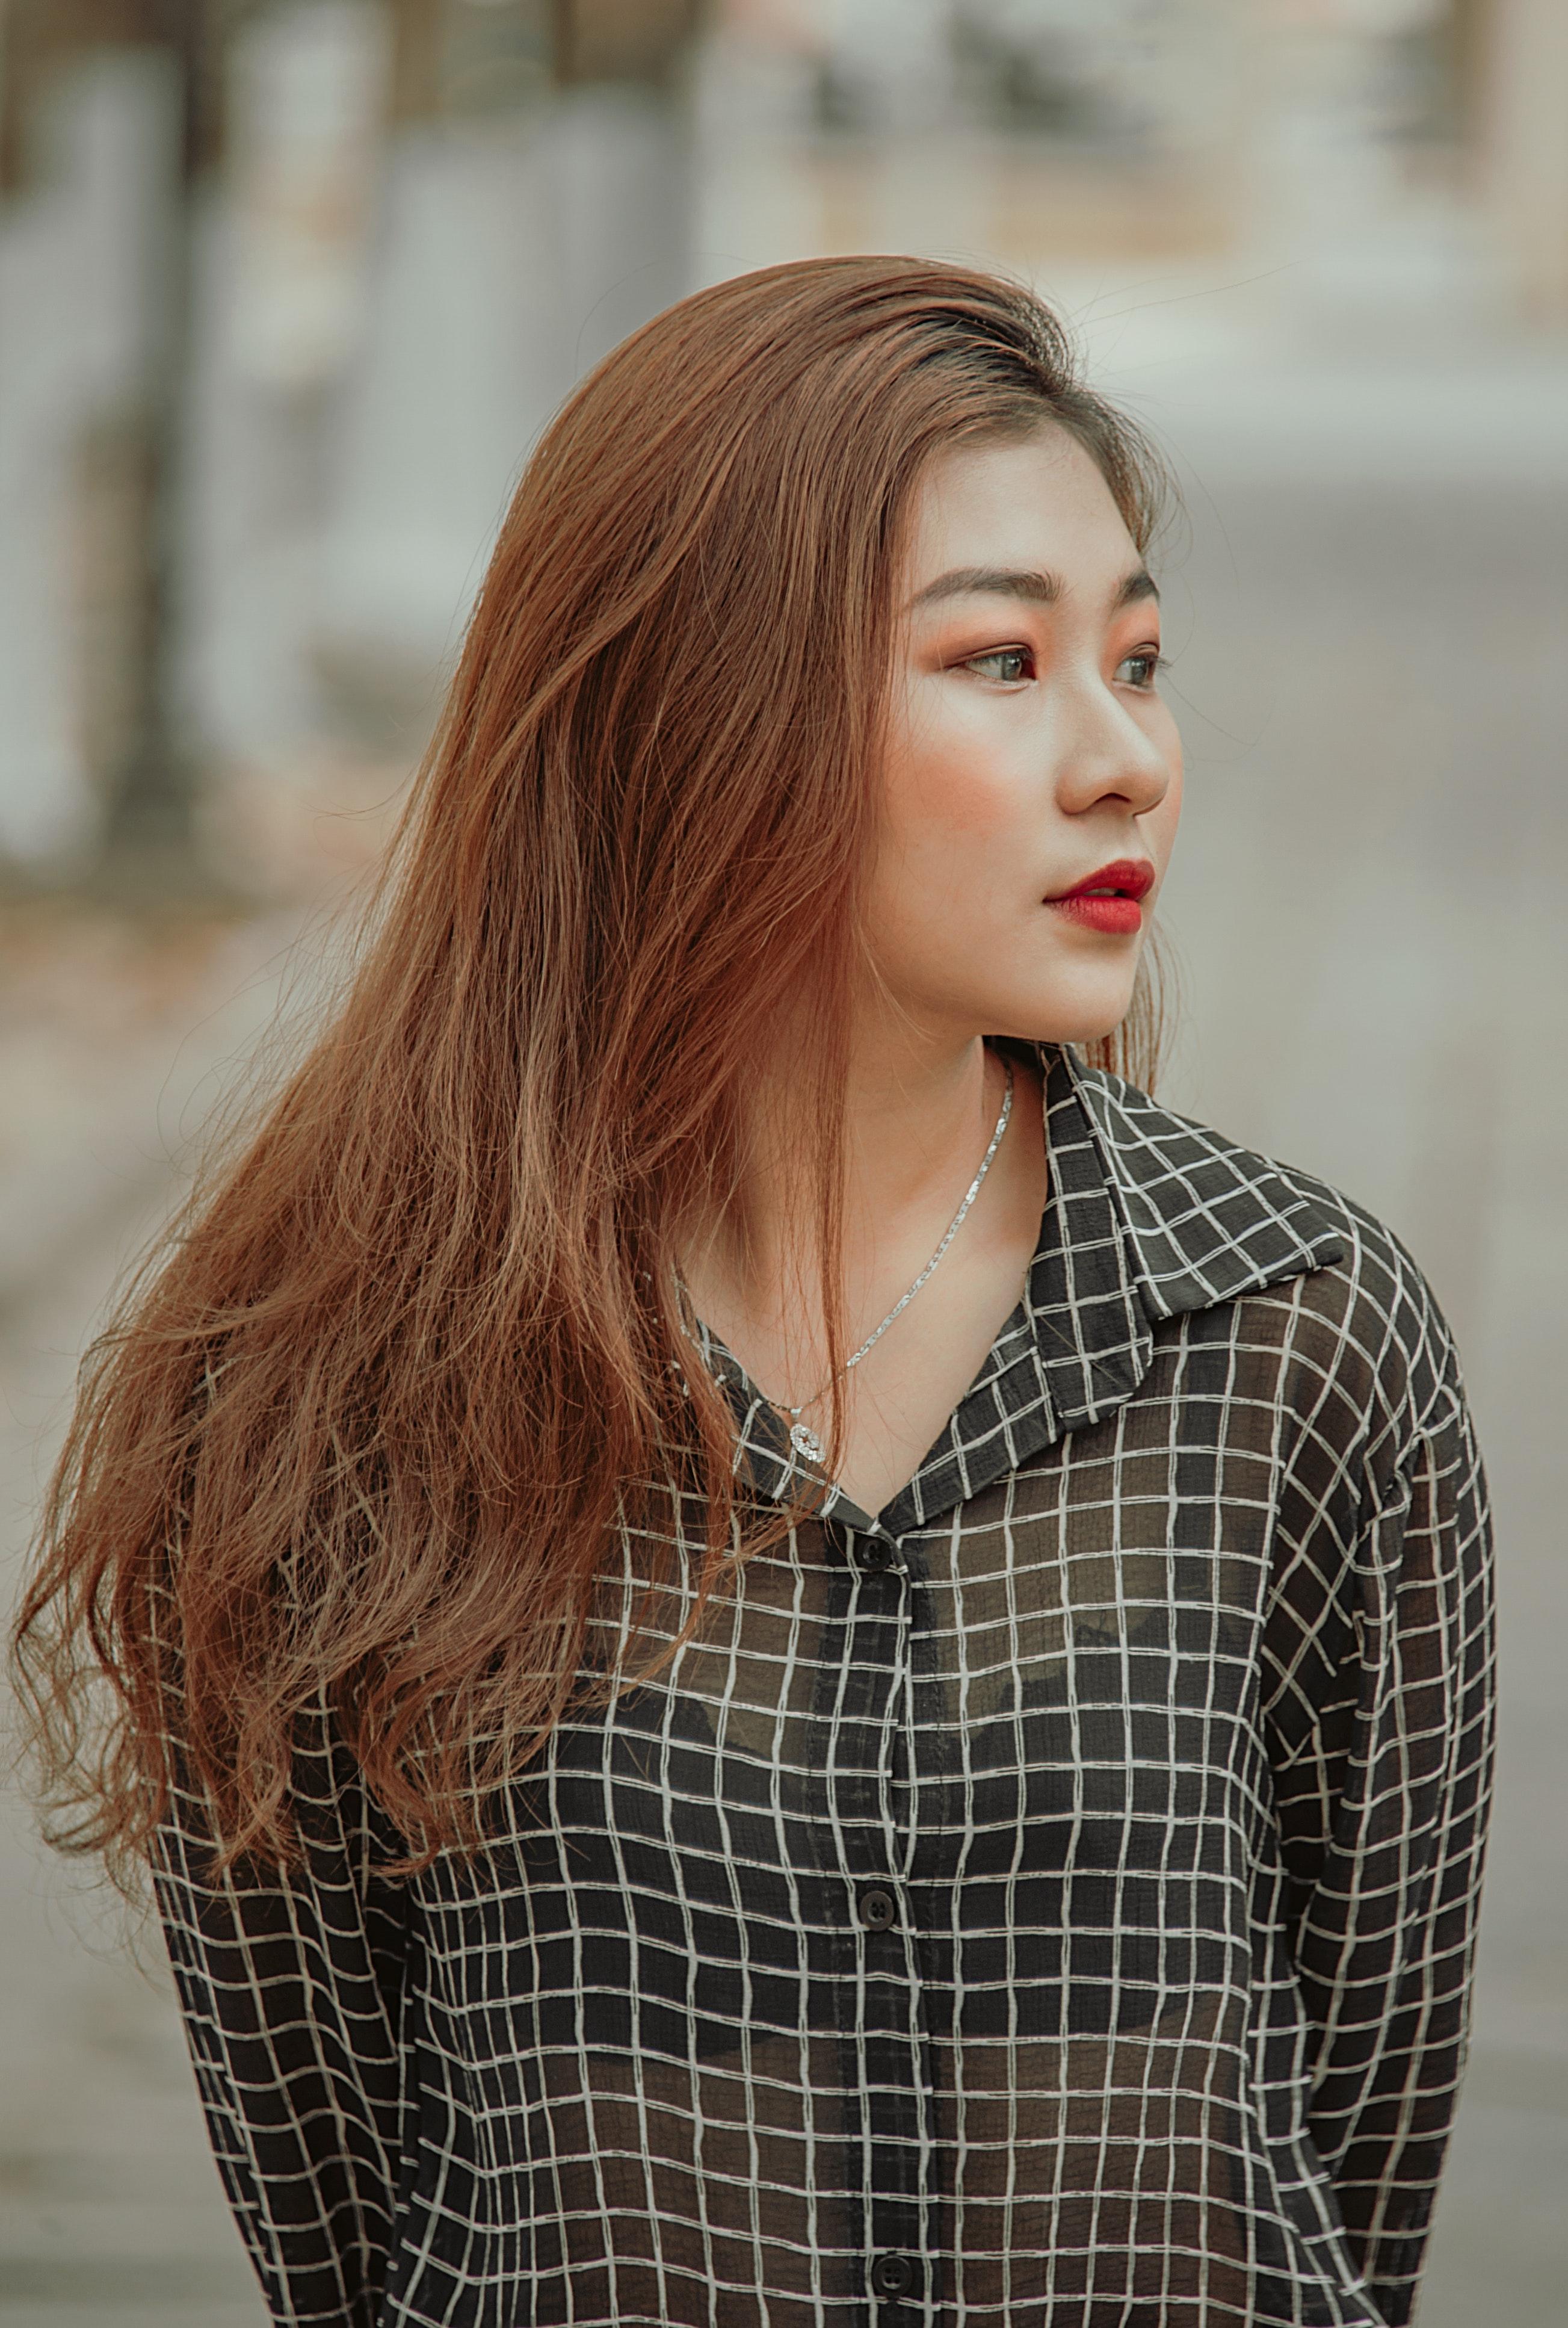 Woman wearing black and white checkered dress shirt photo